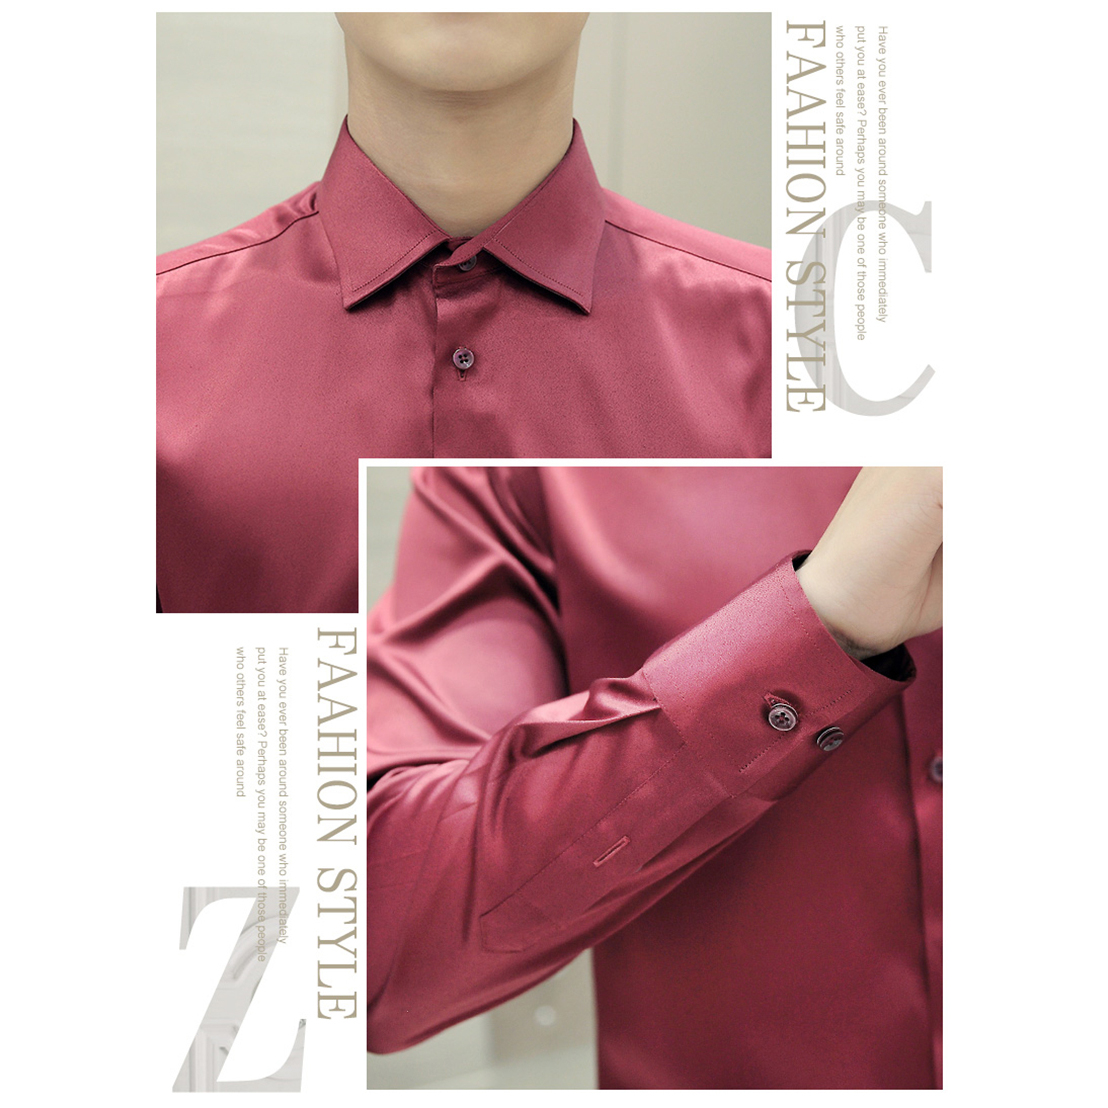 Plus Size 5XL 2020 New Men's Luxury Shirts Wedding Dress Long Sleeve Shirt Silk Tuxedo Shirt Men Mercerized Cotton Shirt 4